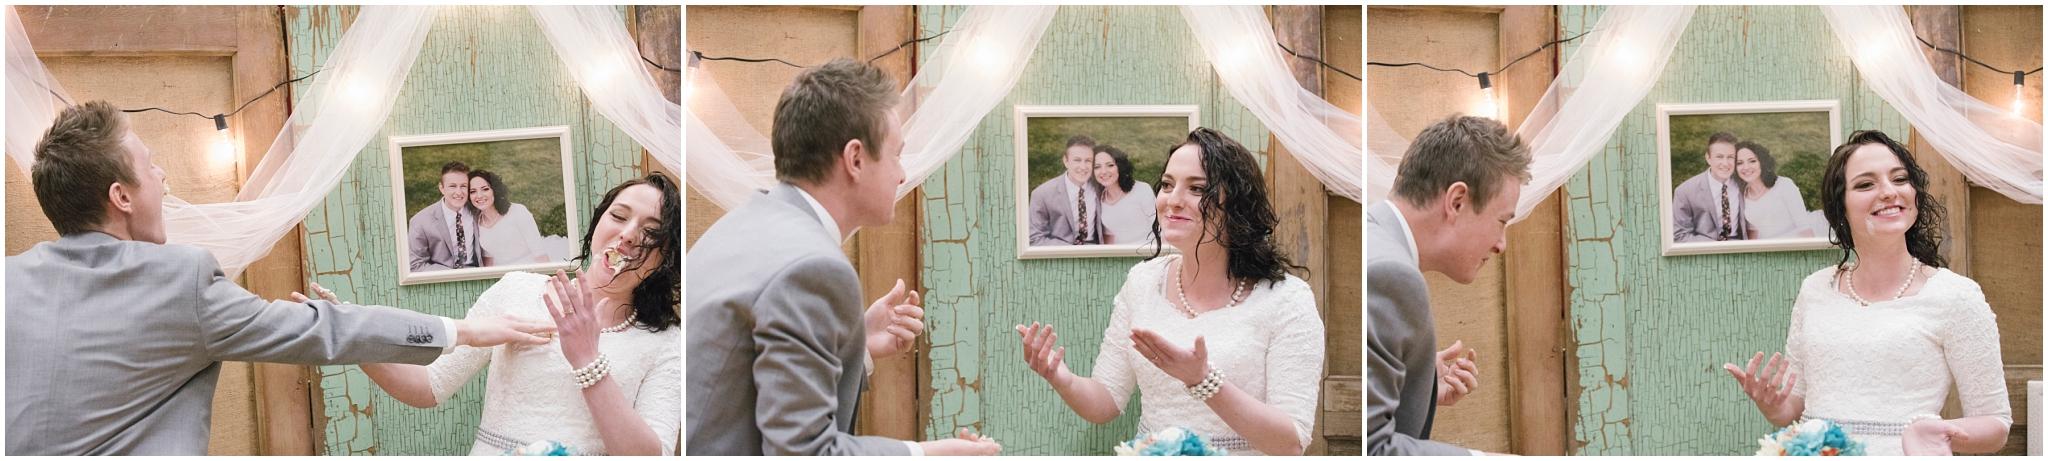 Bo Alyssa Wedding-491_Lizzie-B-Imagery-Utah-Wedding-Photographer-Central-Utah-Photographer-Utah-County-Manti-Temple.jpg